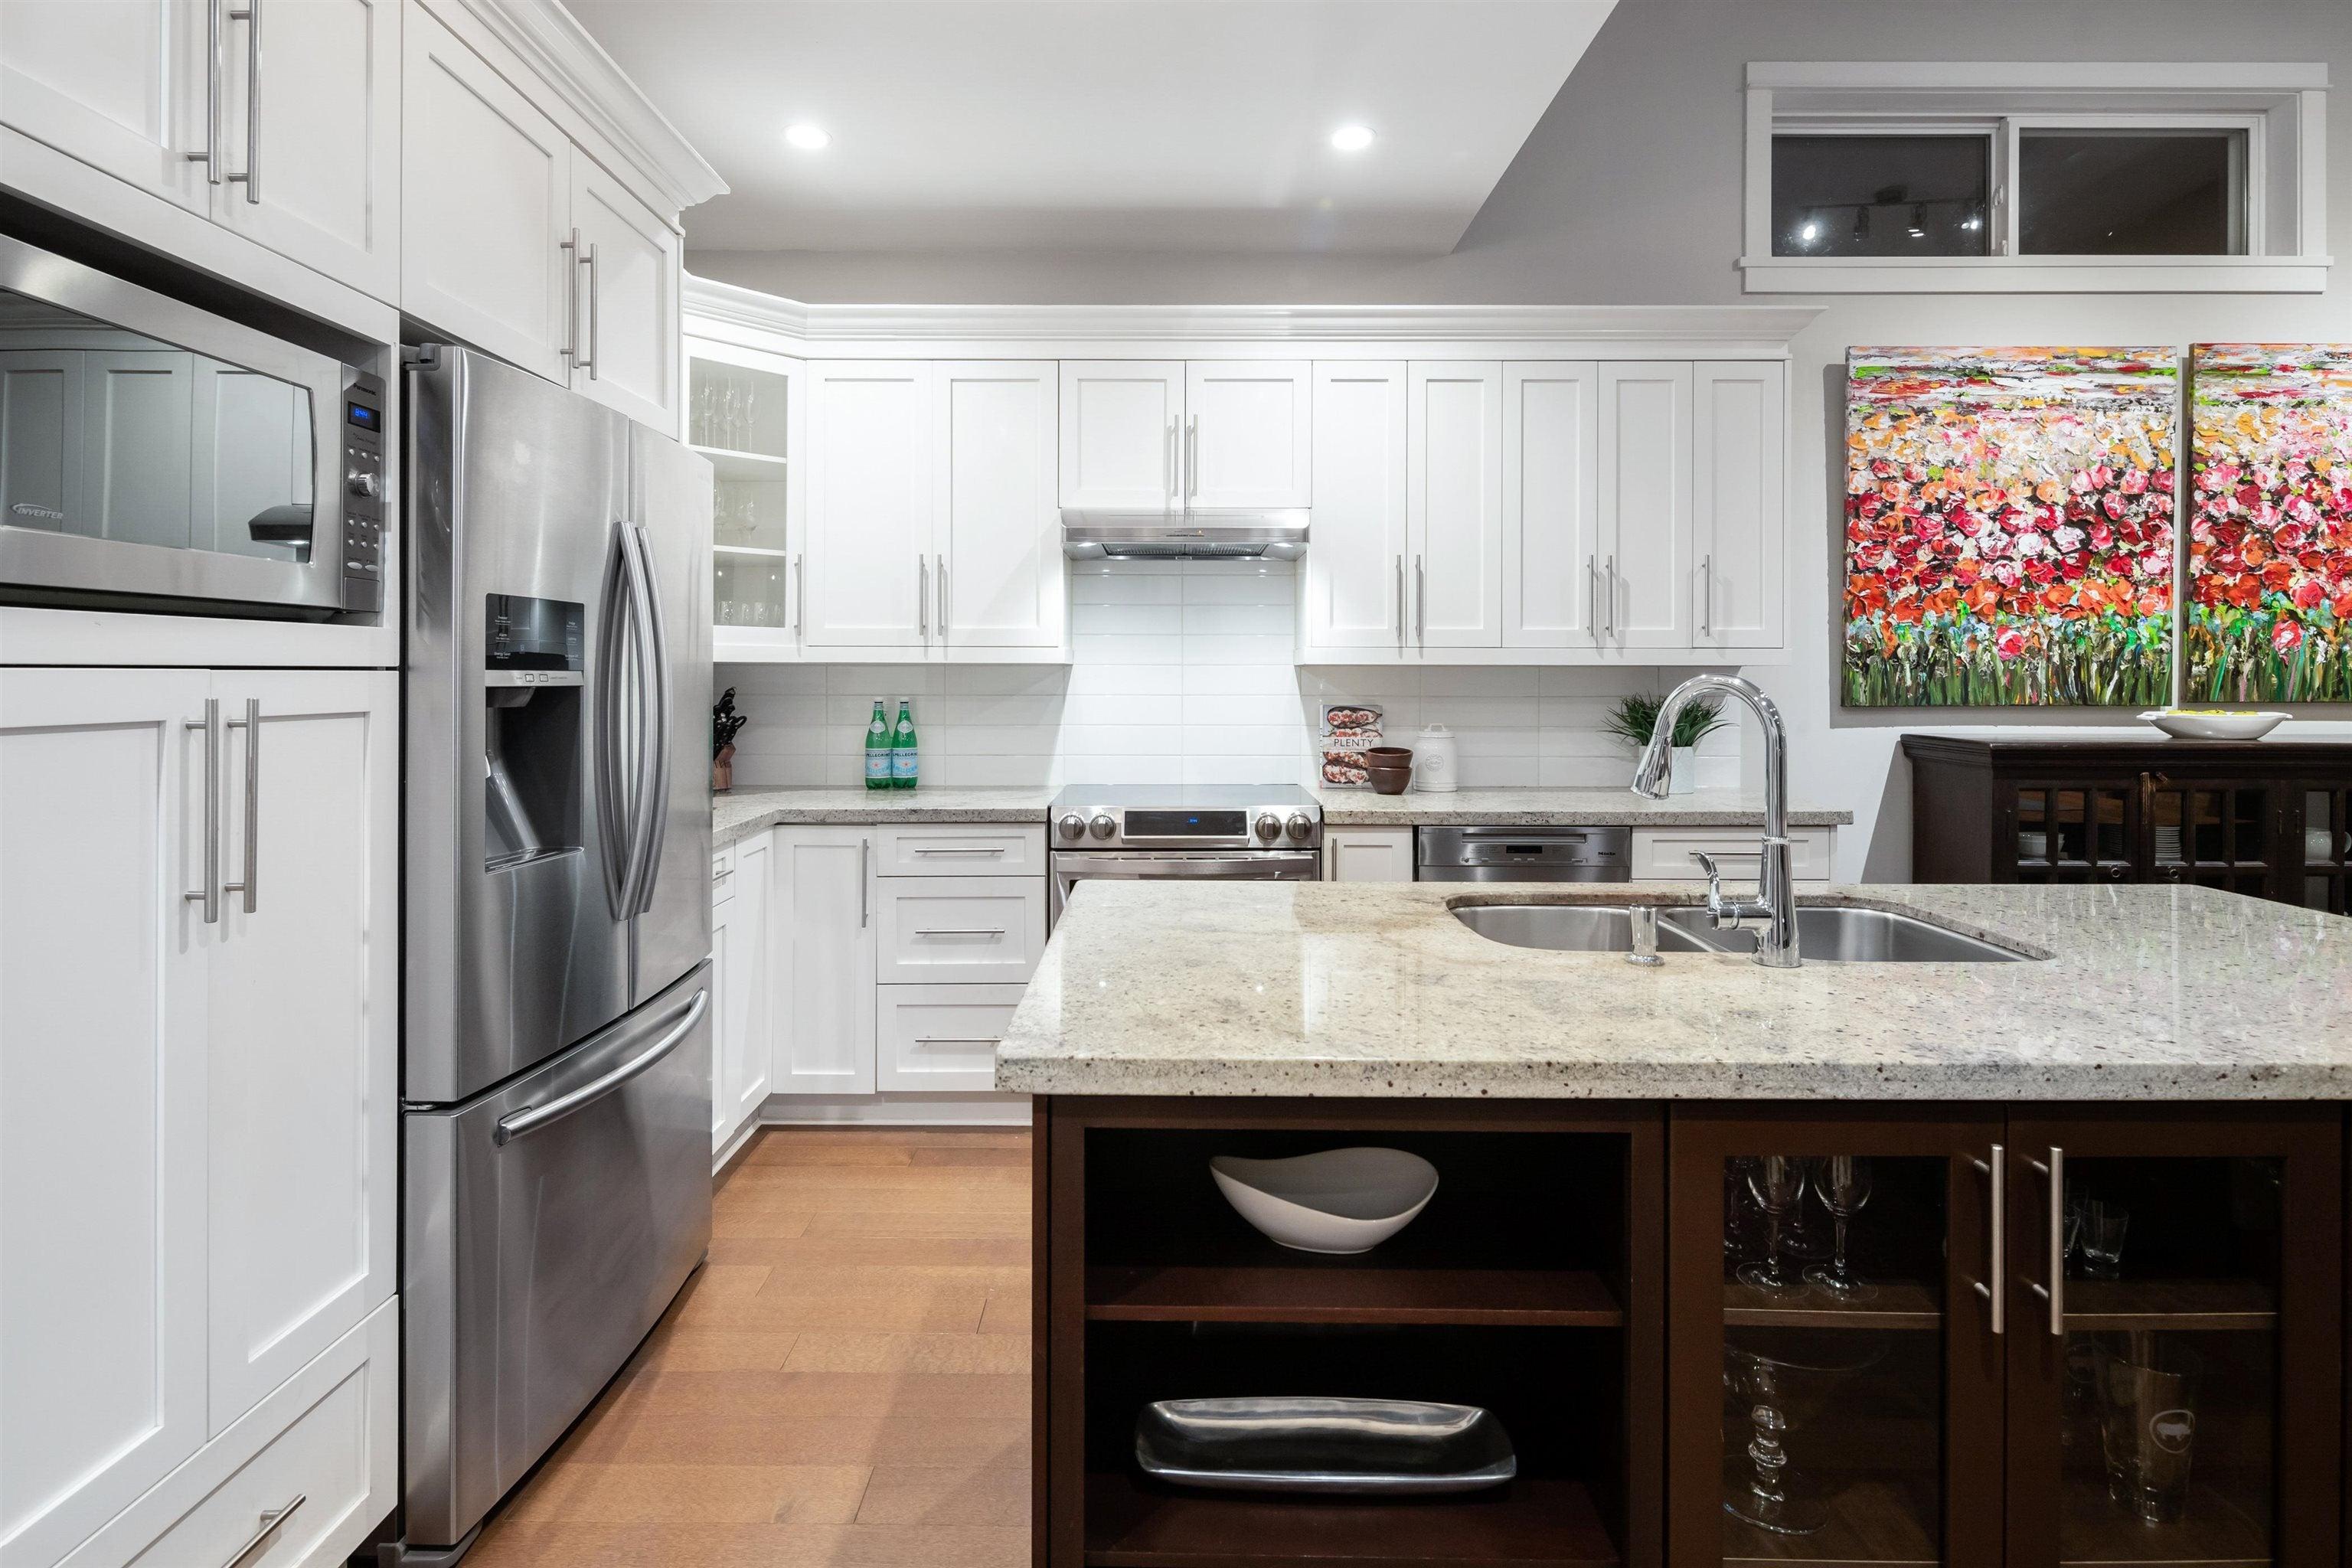 2258 WINDRIDGE DRIVE - Seymour NV House/Single Family for sale, 5 Bedrooms (R2617156) - #15